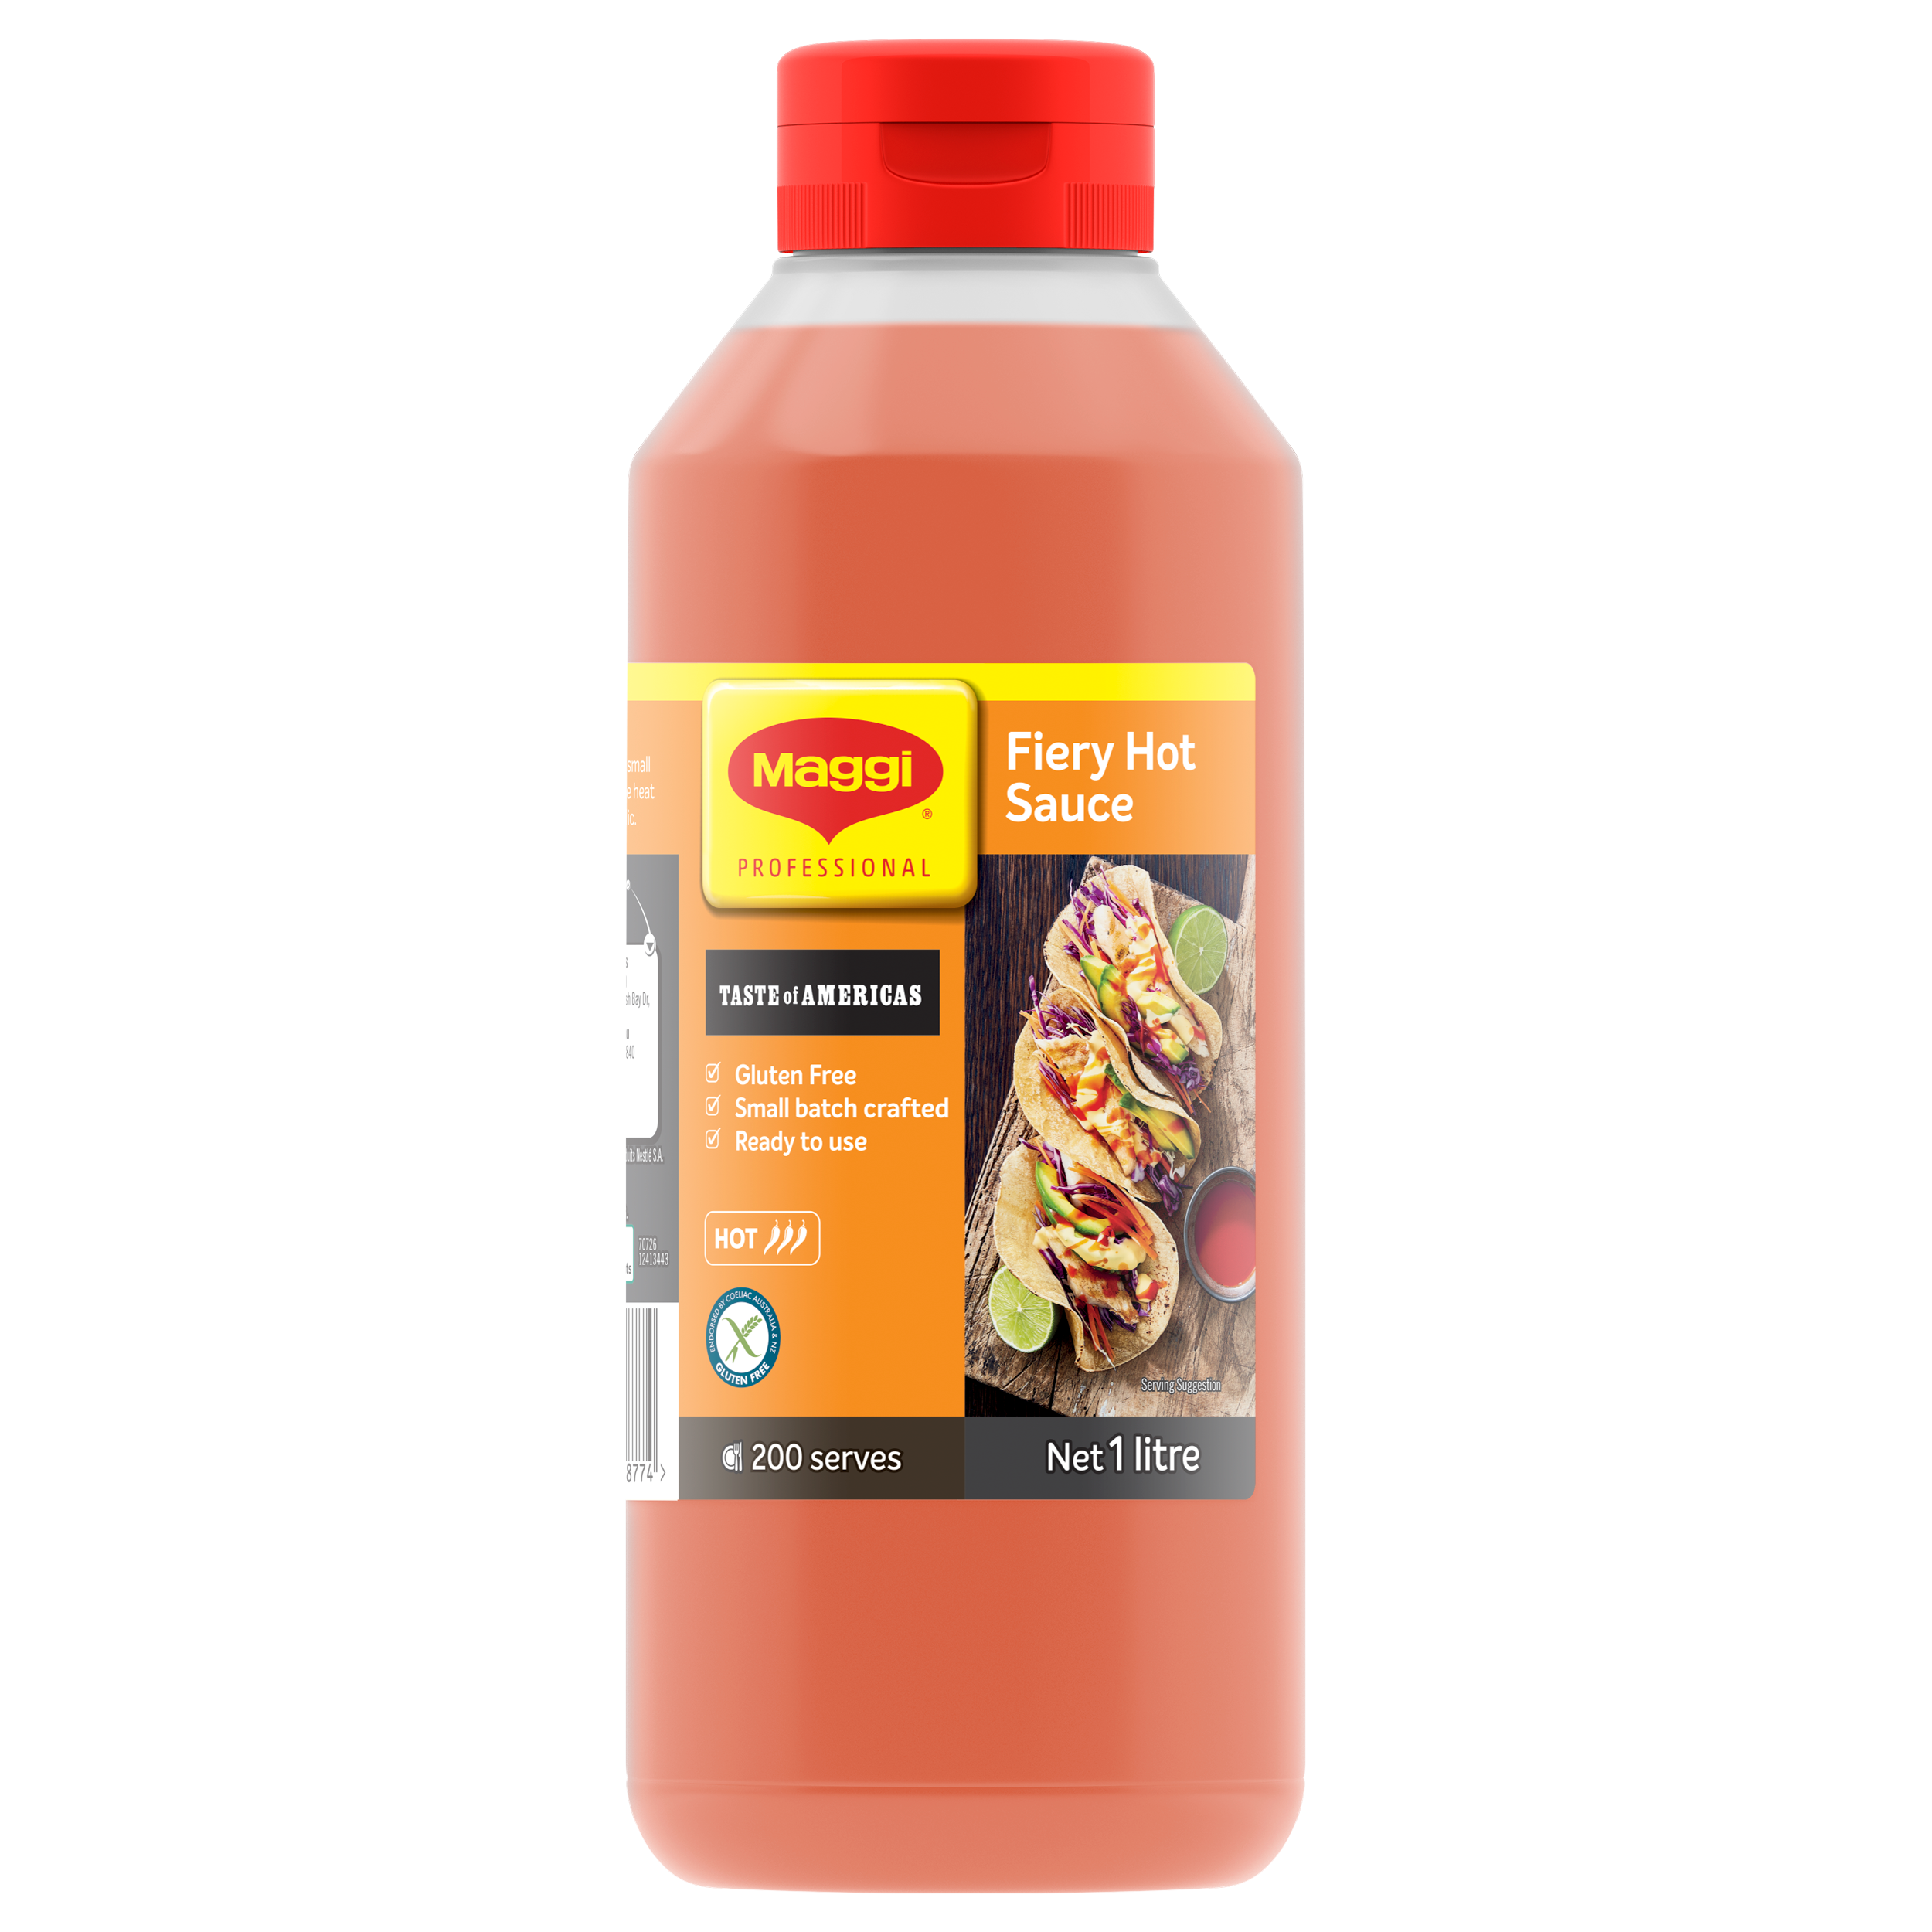 MAGGI Taste of Americas Fiery Hot Sauce 1L.png